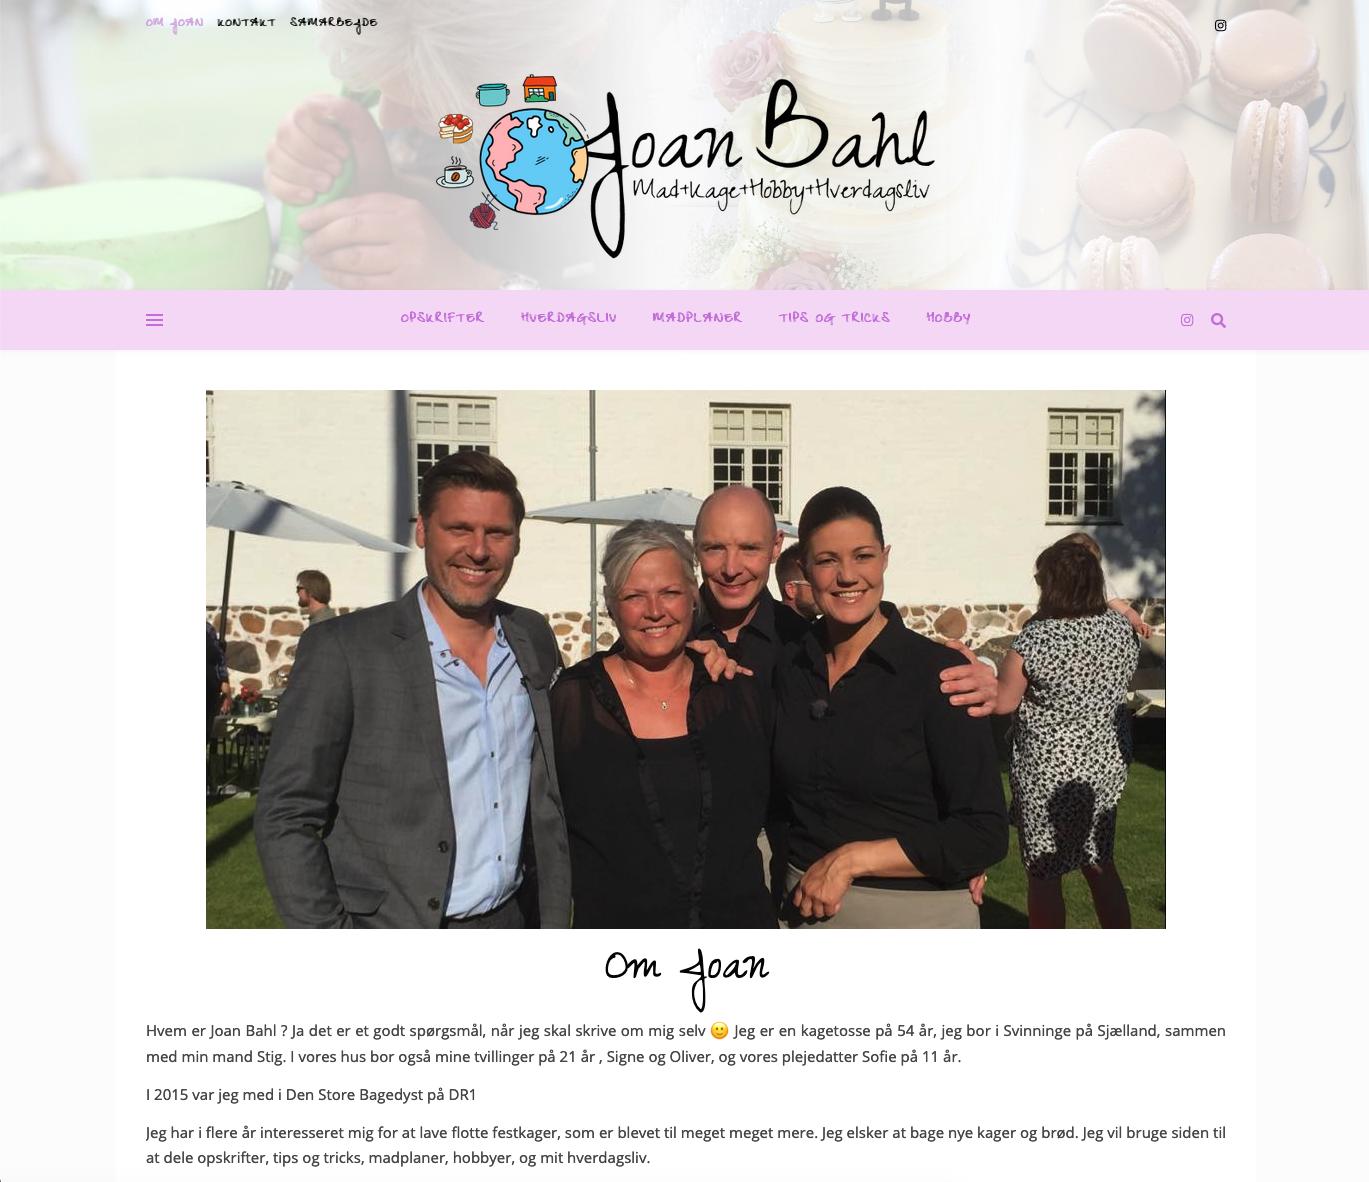 JoanBahl.dk